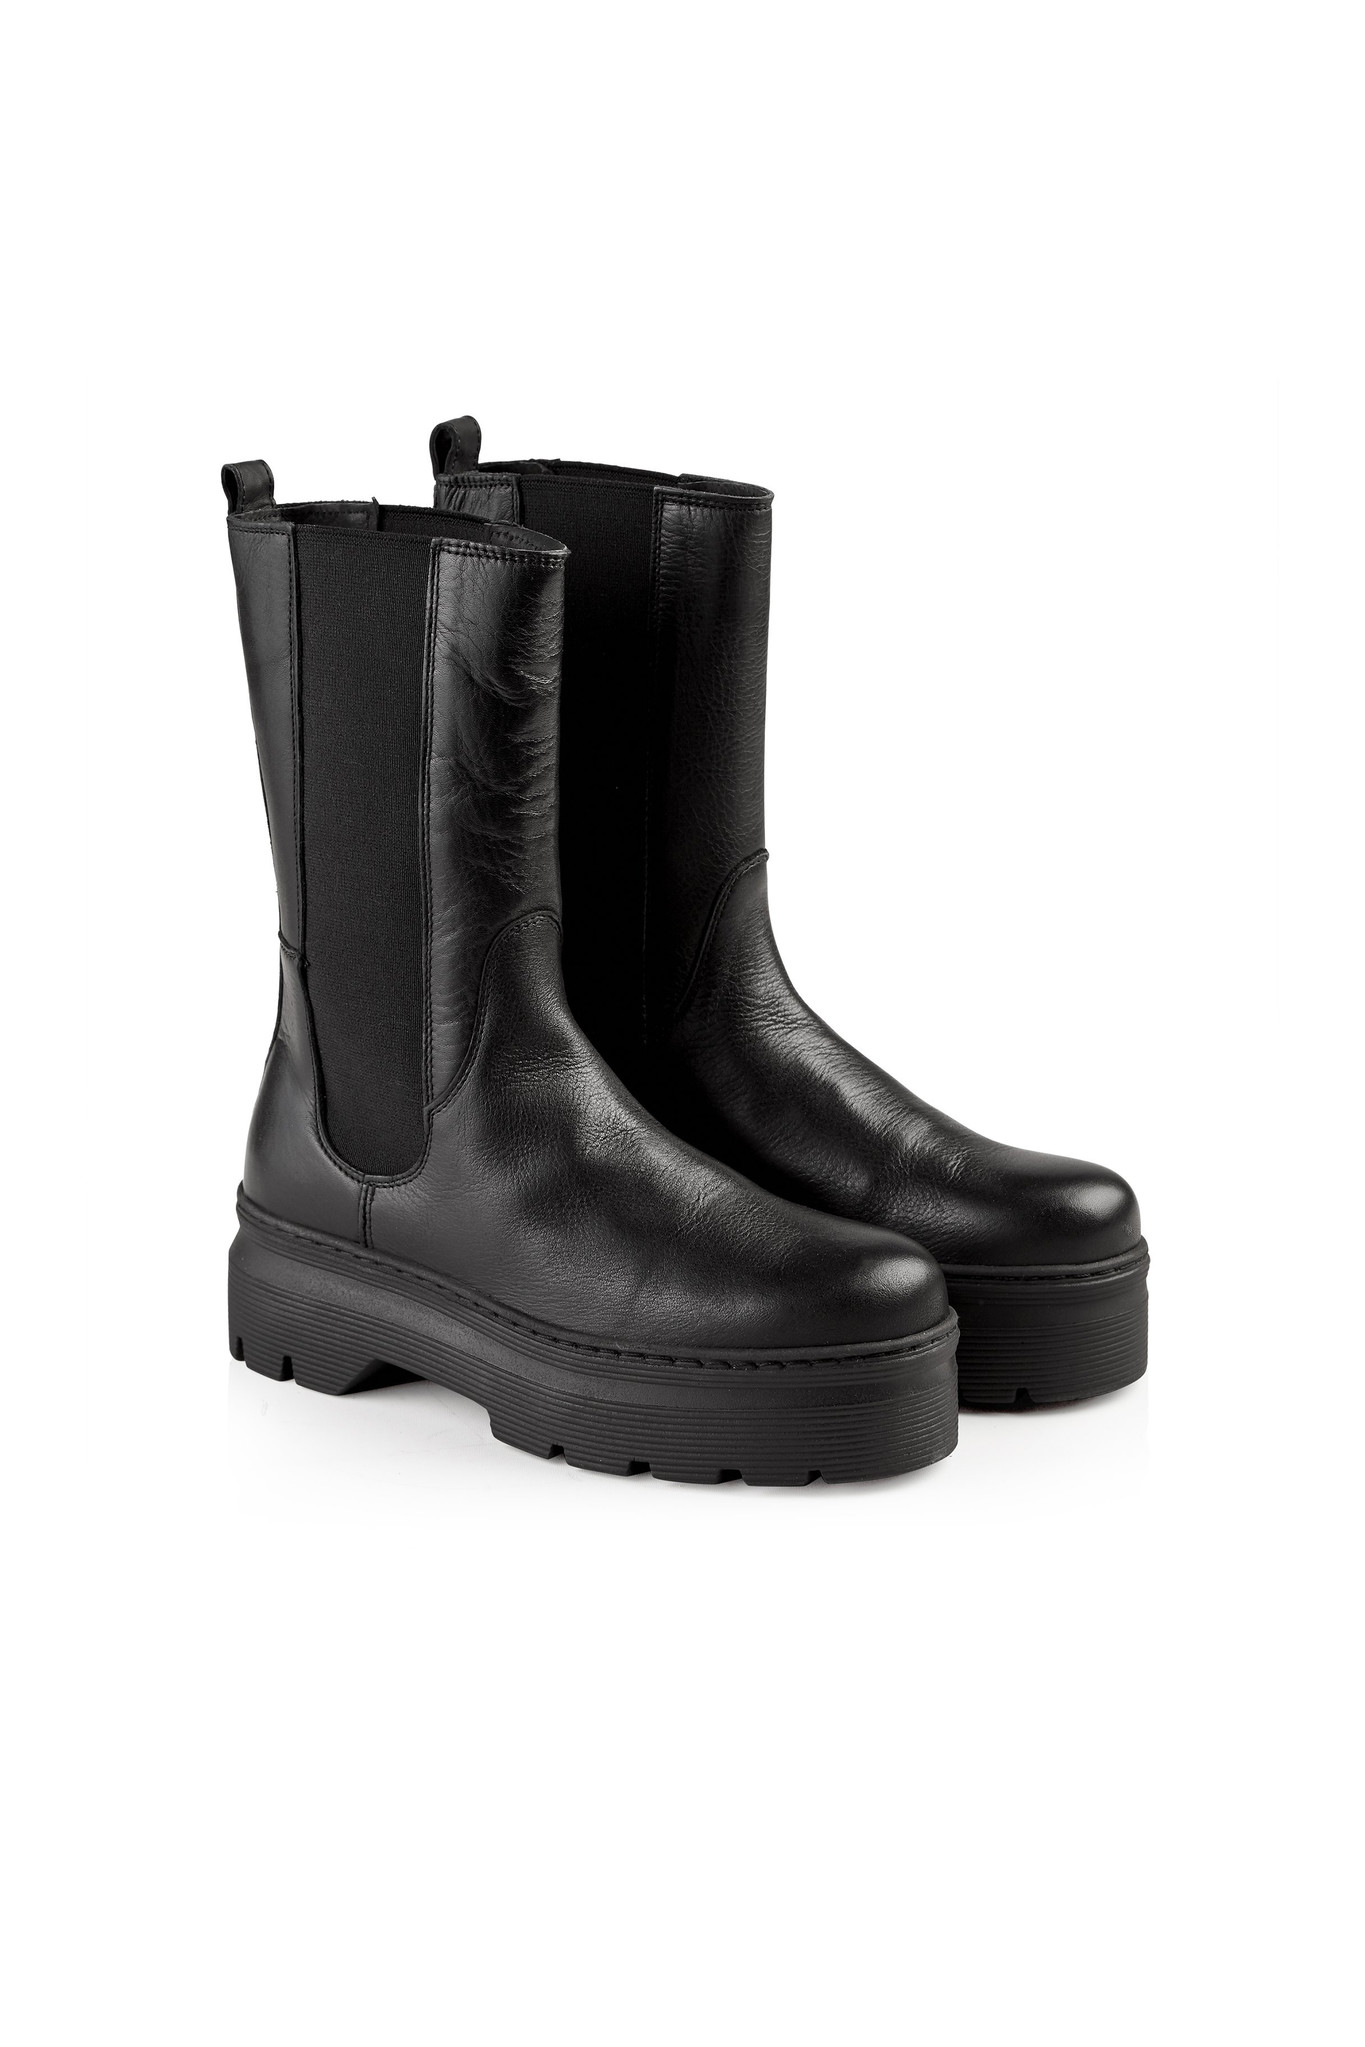 Aya Leather Boot - Black-2